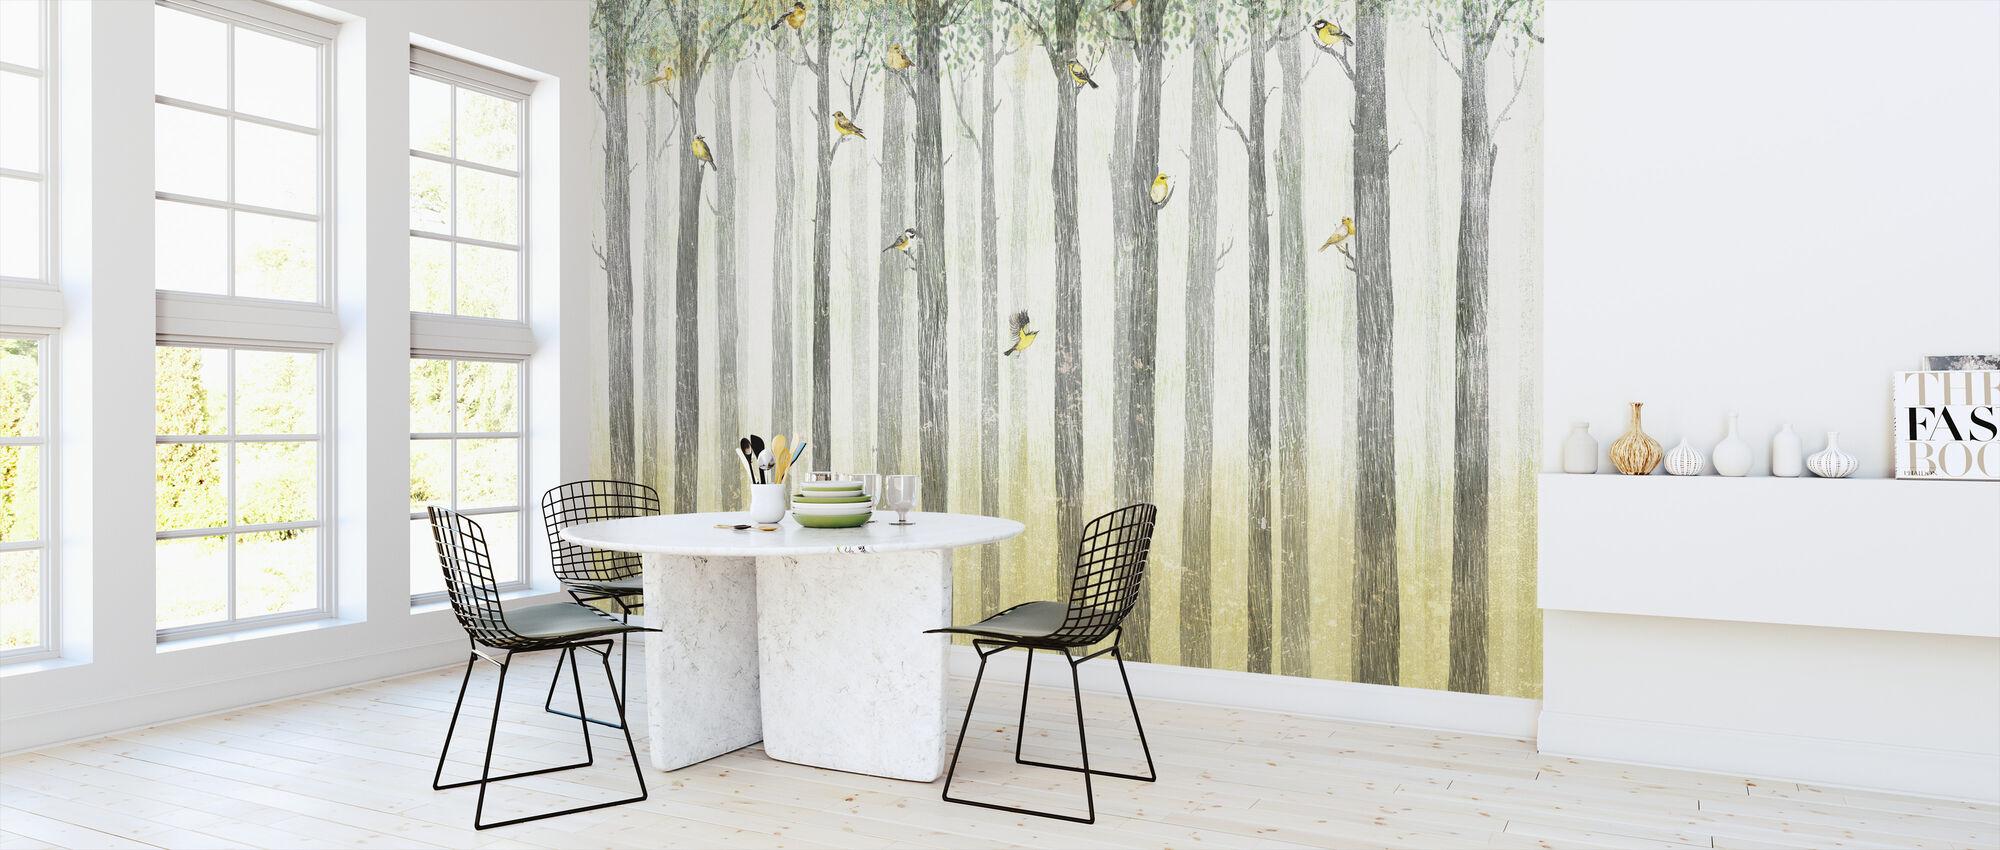 Bird Residence - Daylight - Wallpaper - Kitchen